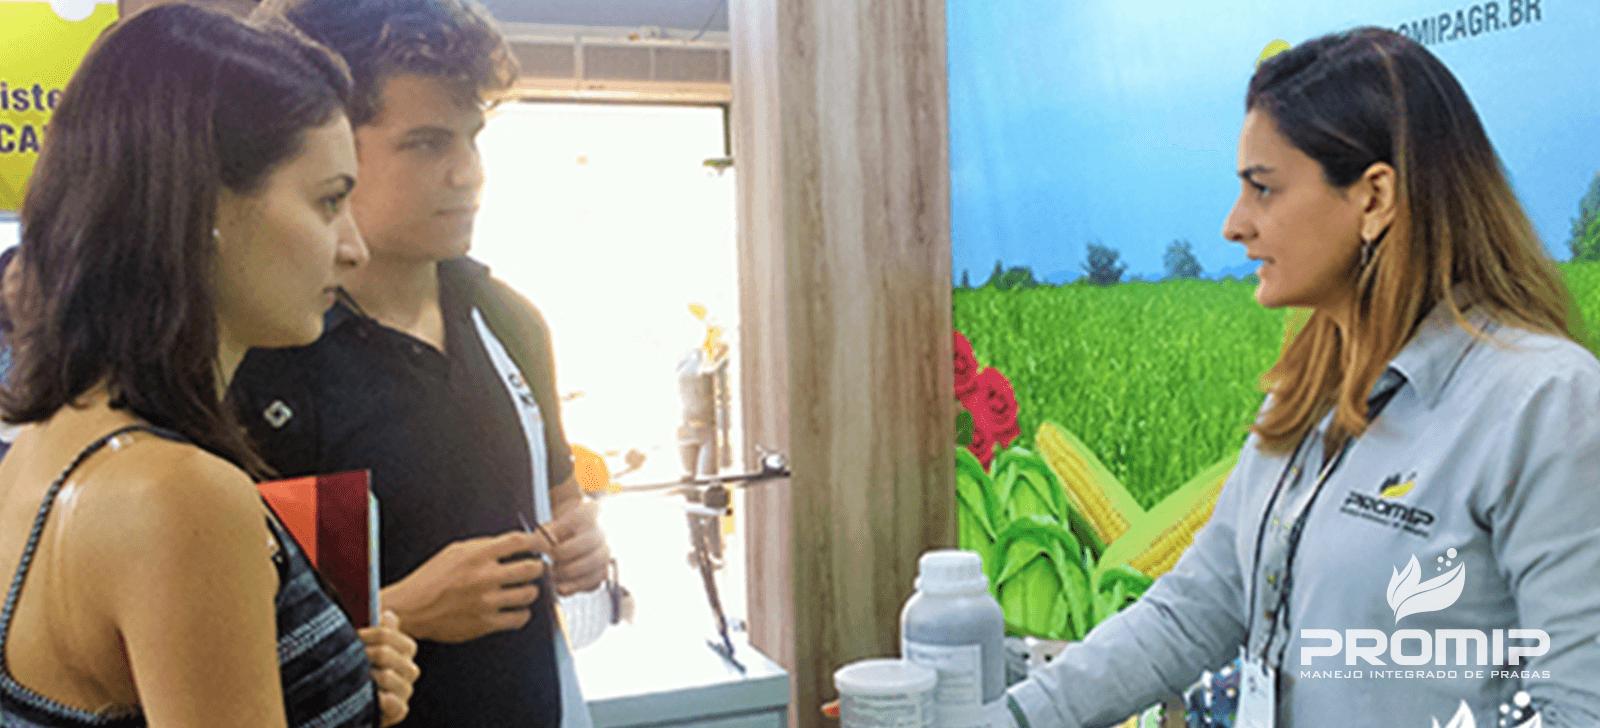 promip manejo integrado de pragas controle biologico solucoes promi ESALQShow